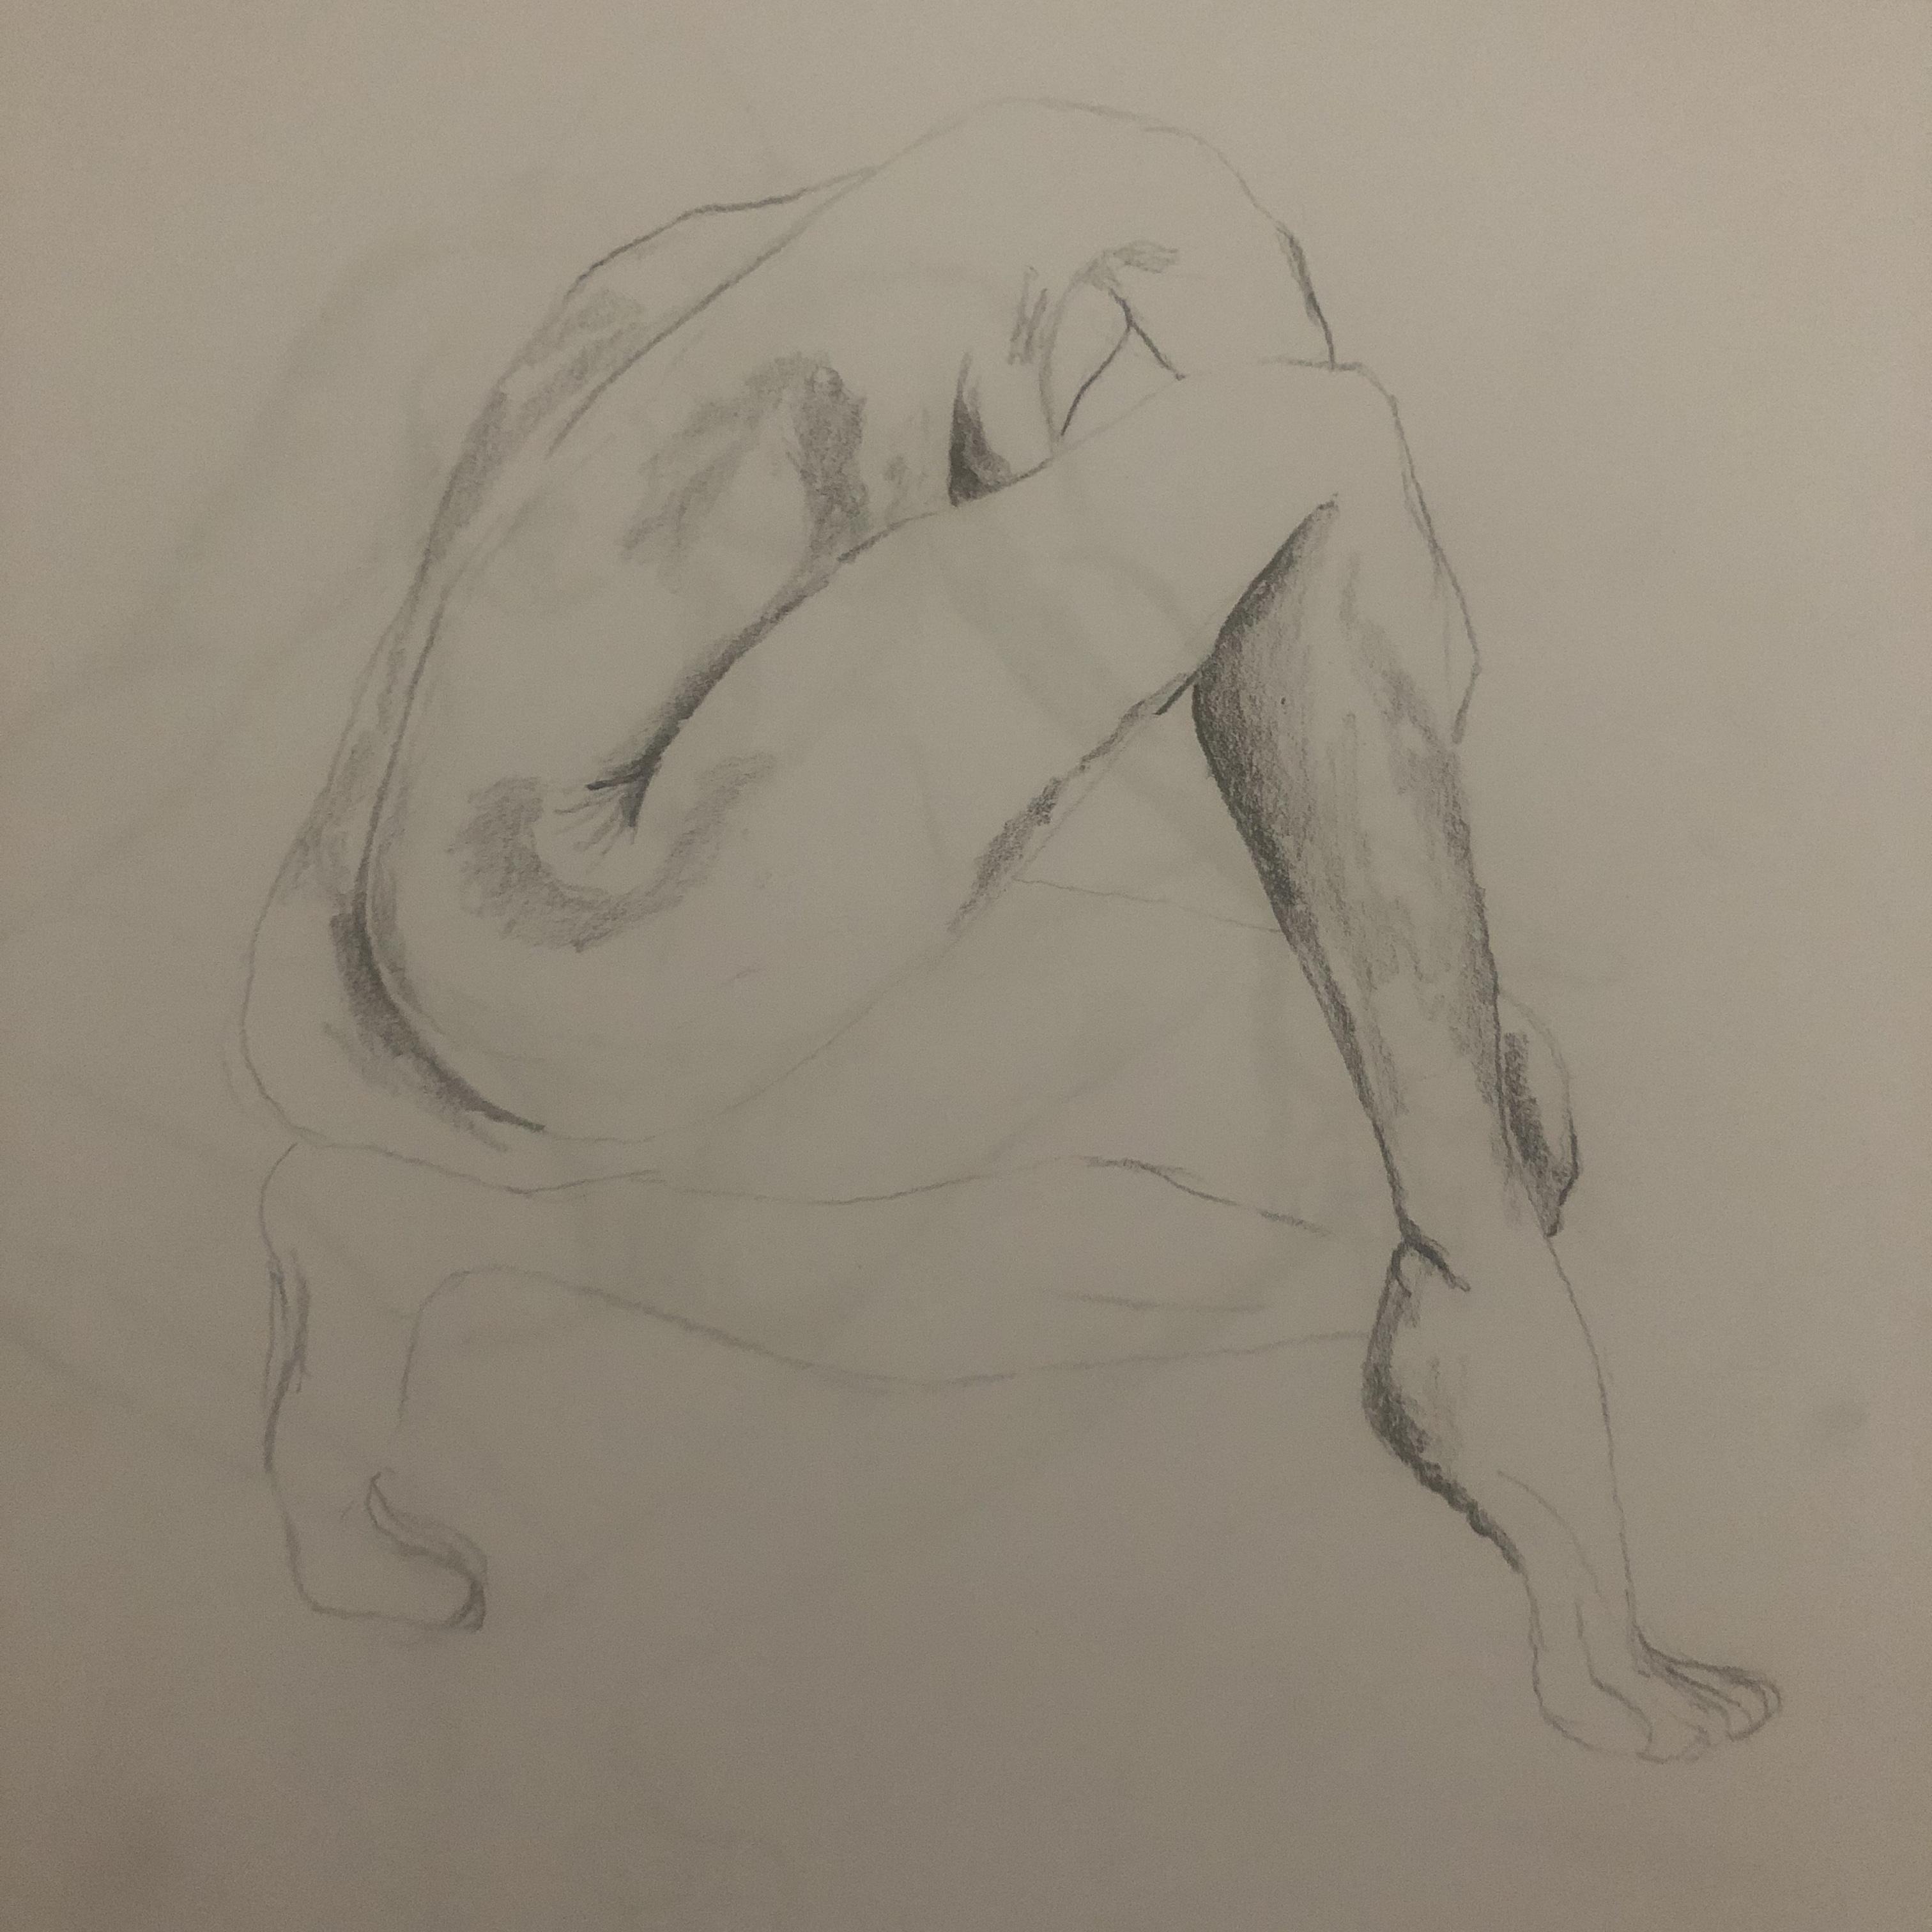 Dessin crayon papier pose accroupi trois quarts dos pied  cours de dessin